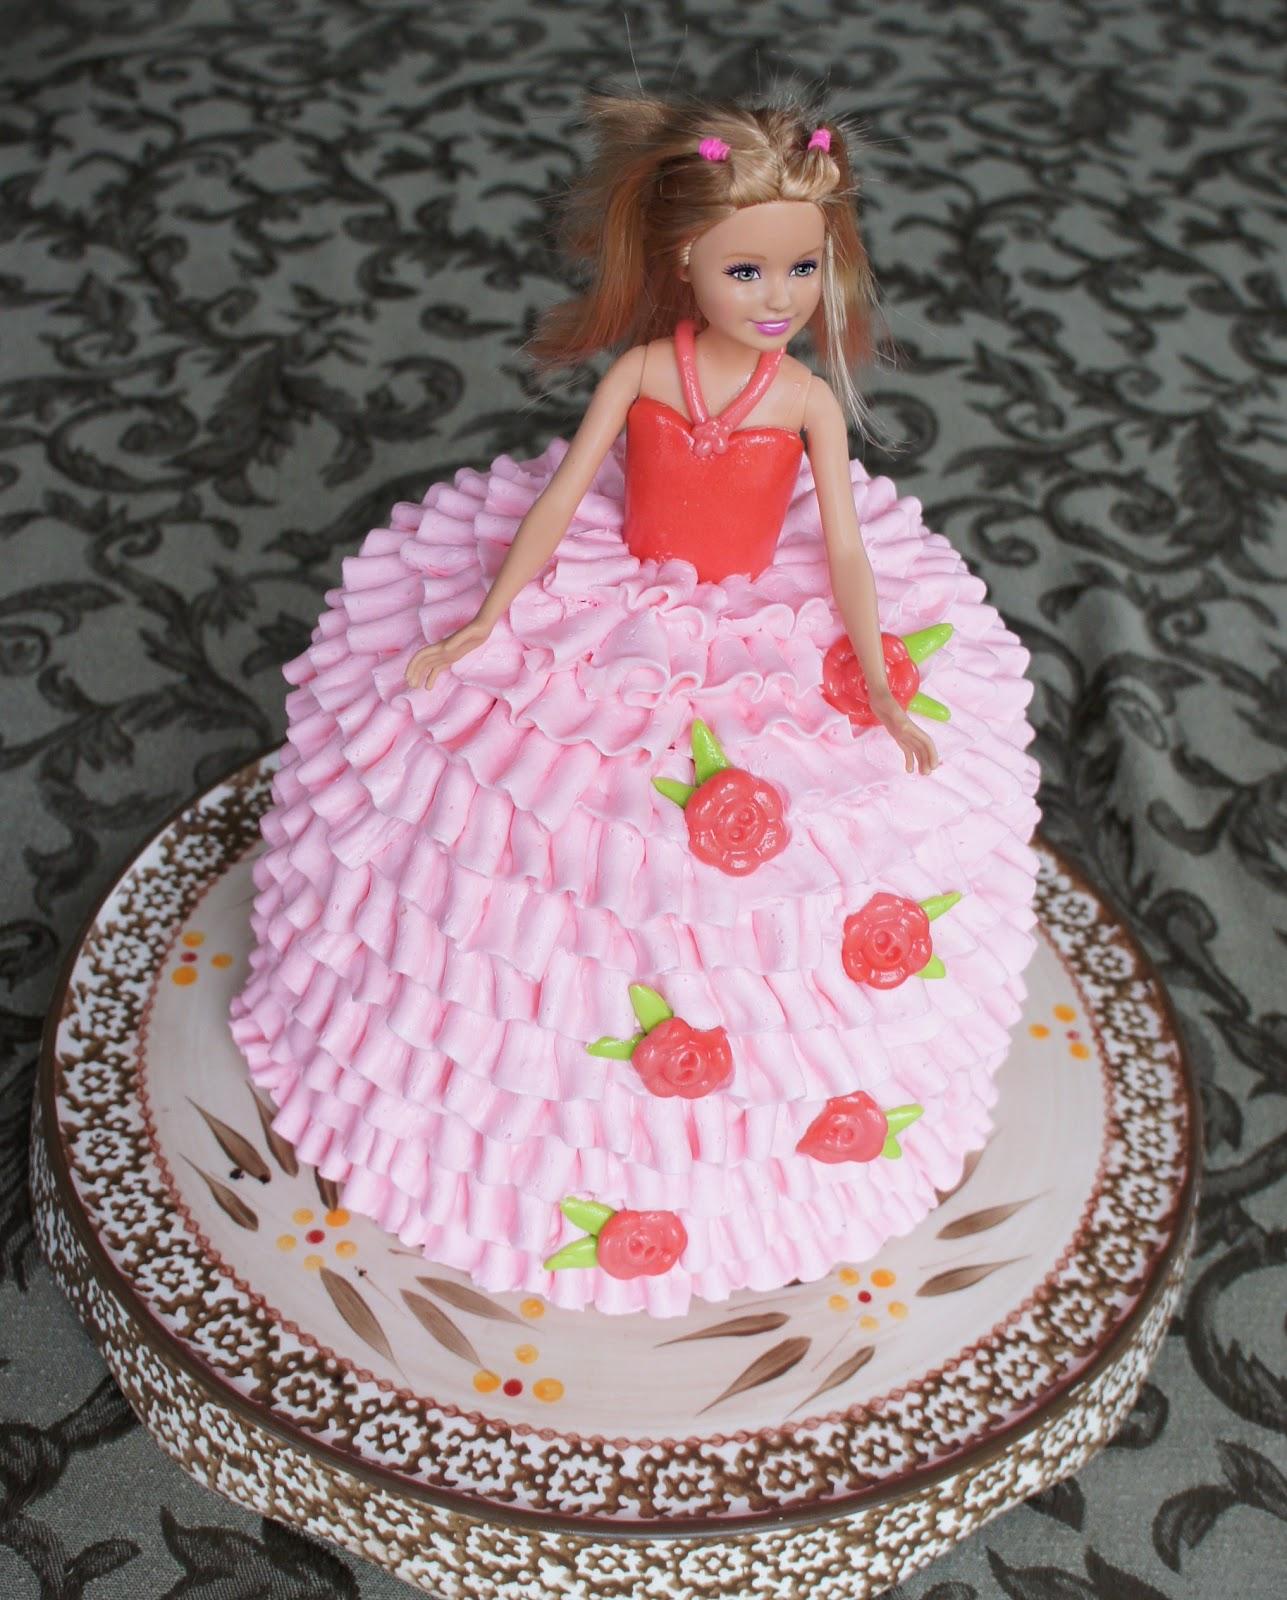 Barbie Shaped Birthday Cakes